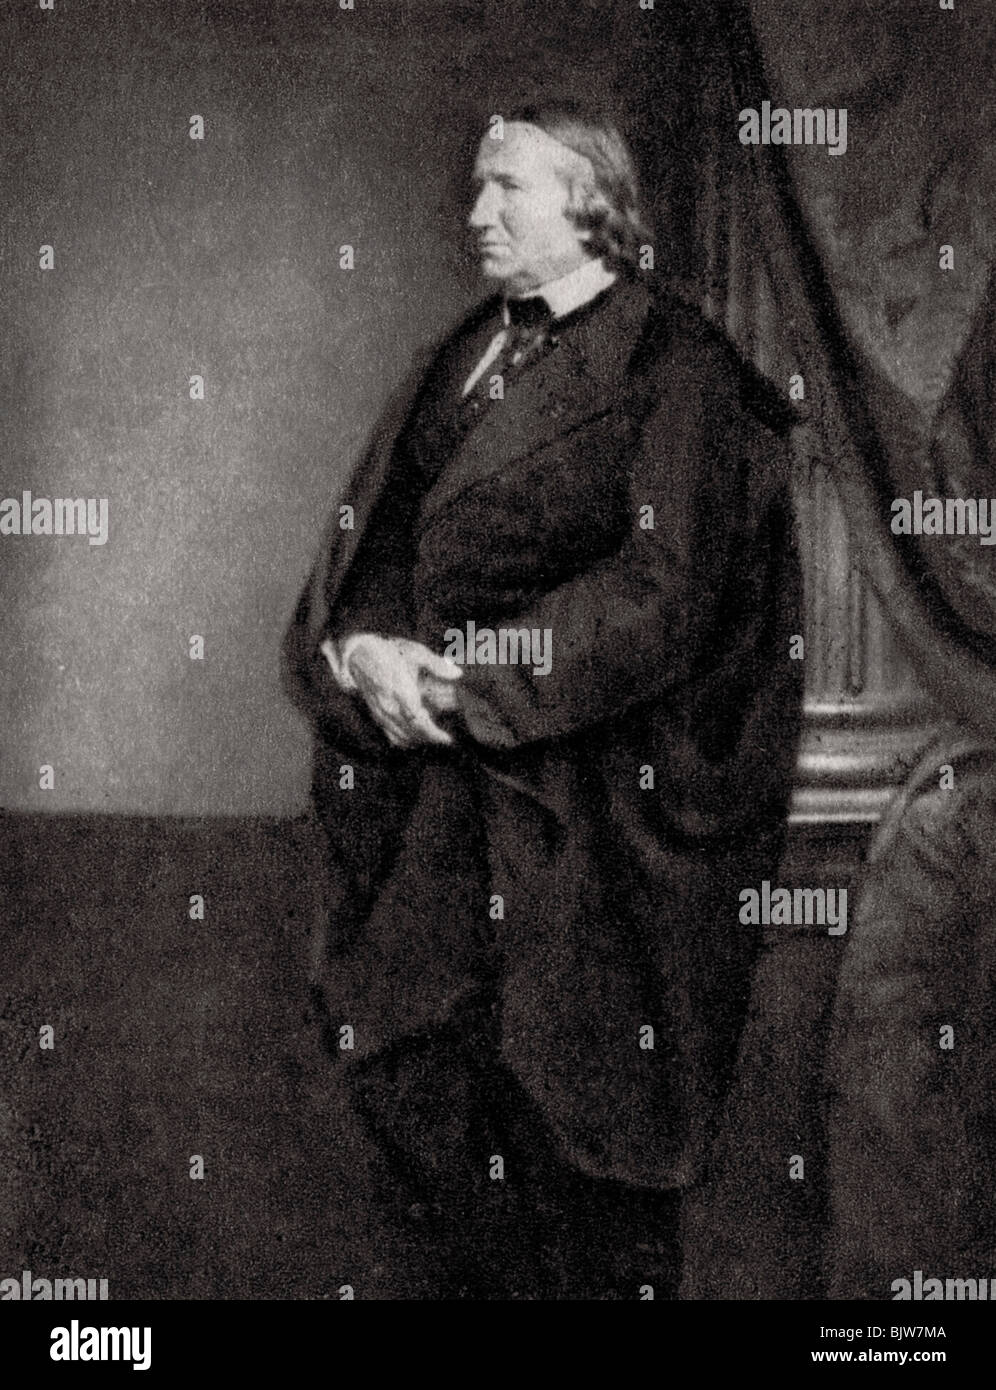 Alfred de Vigny portrait